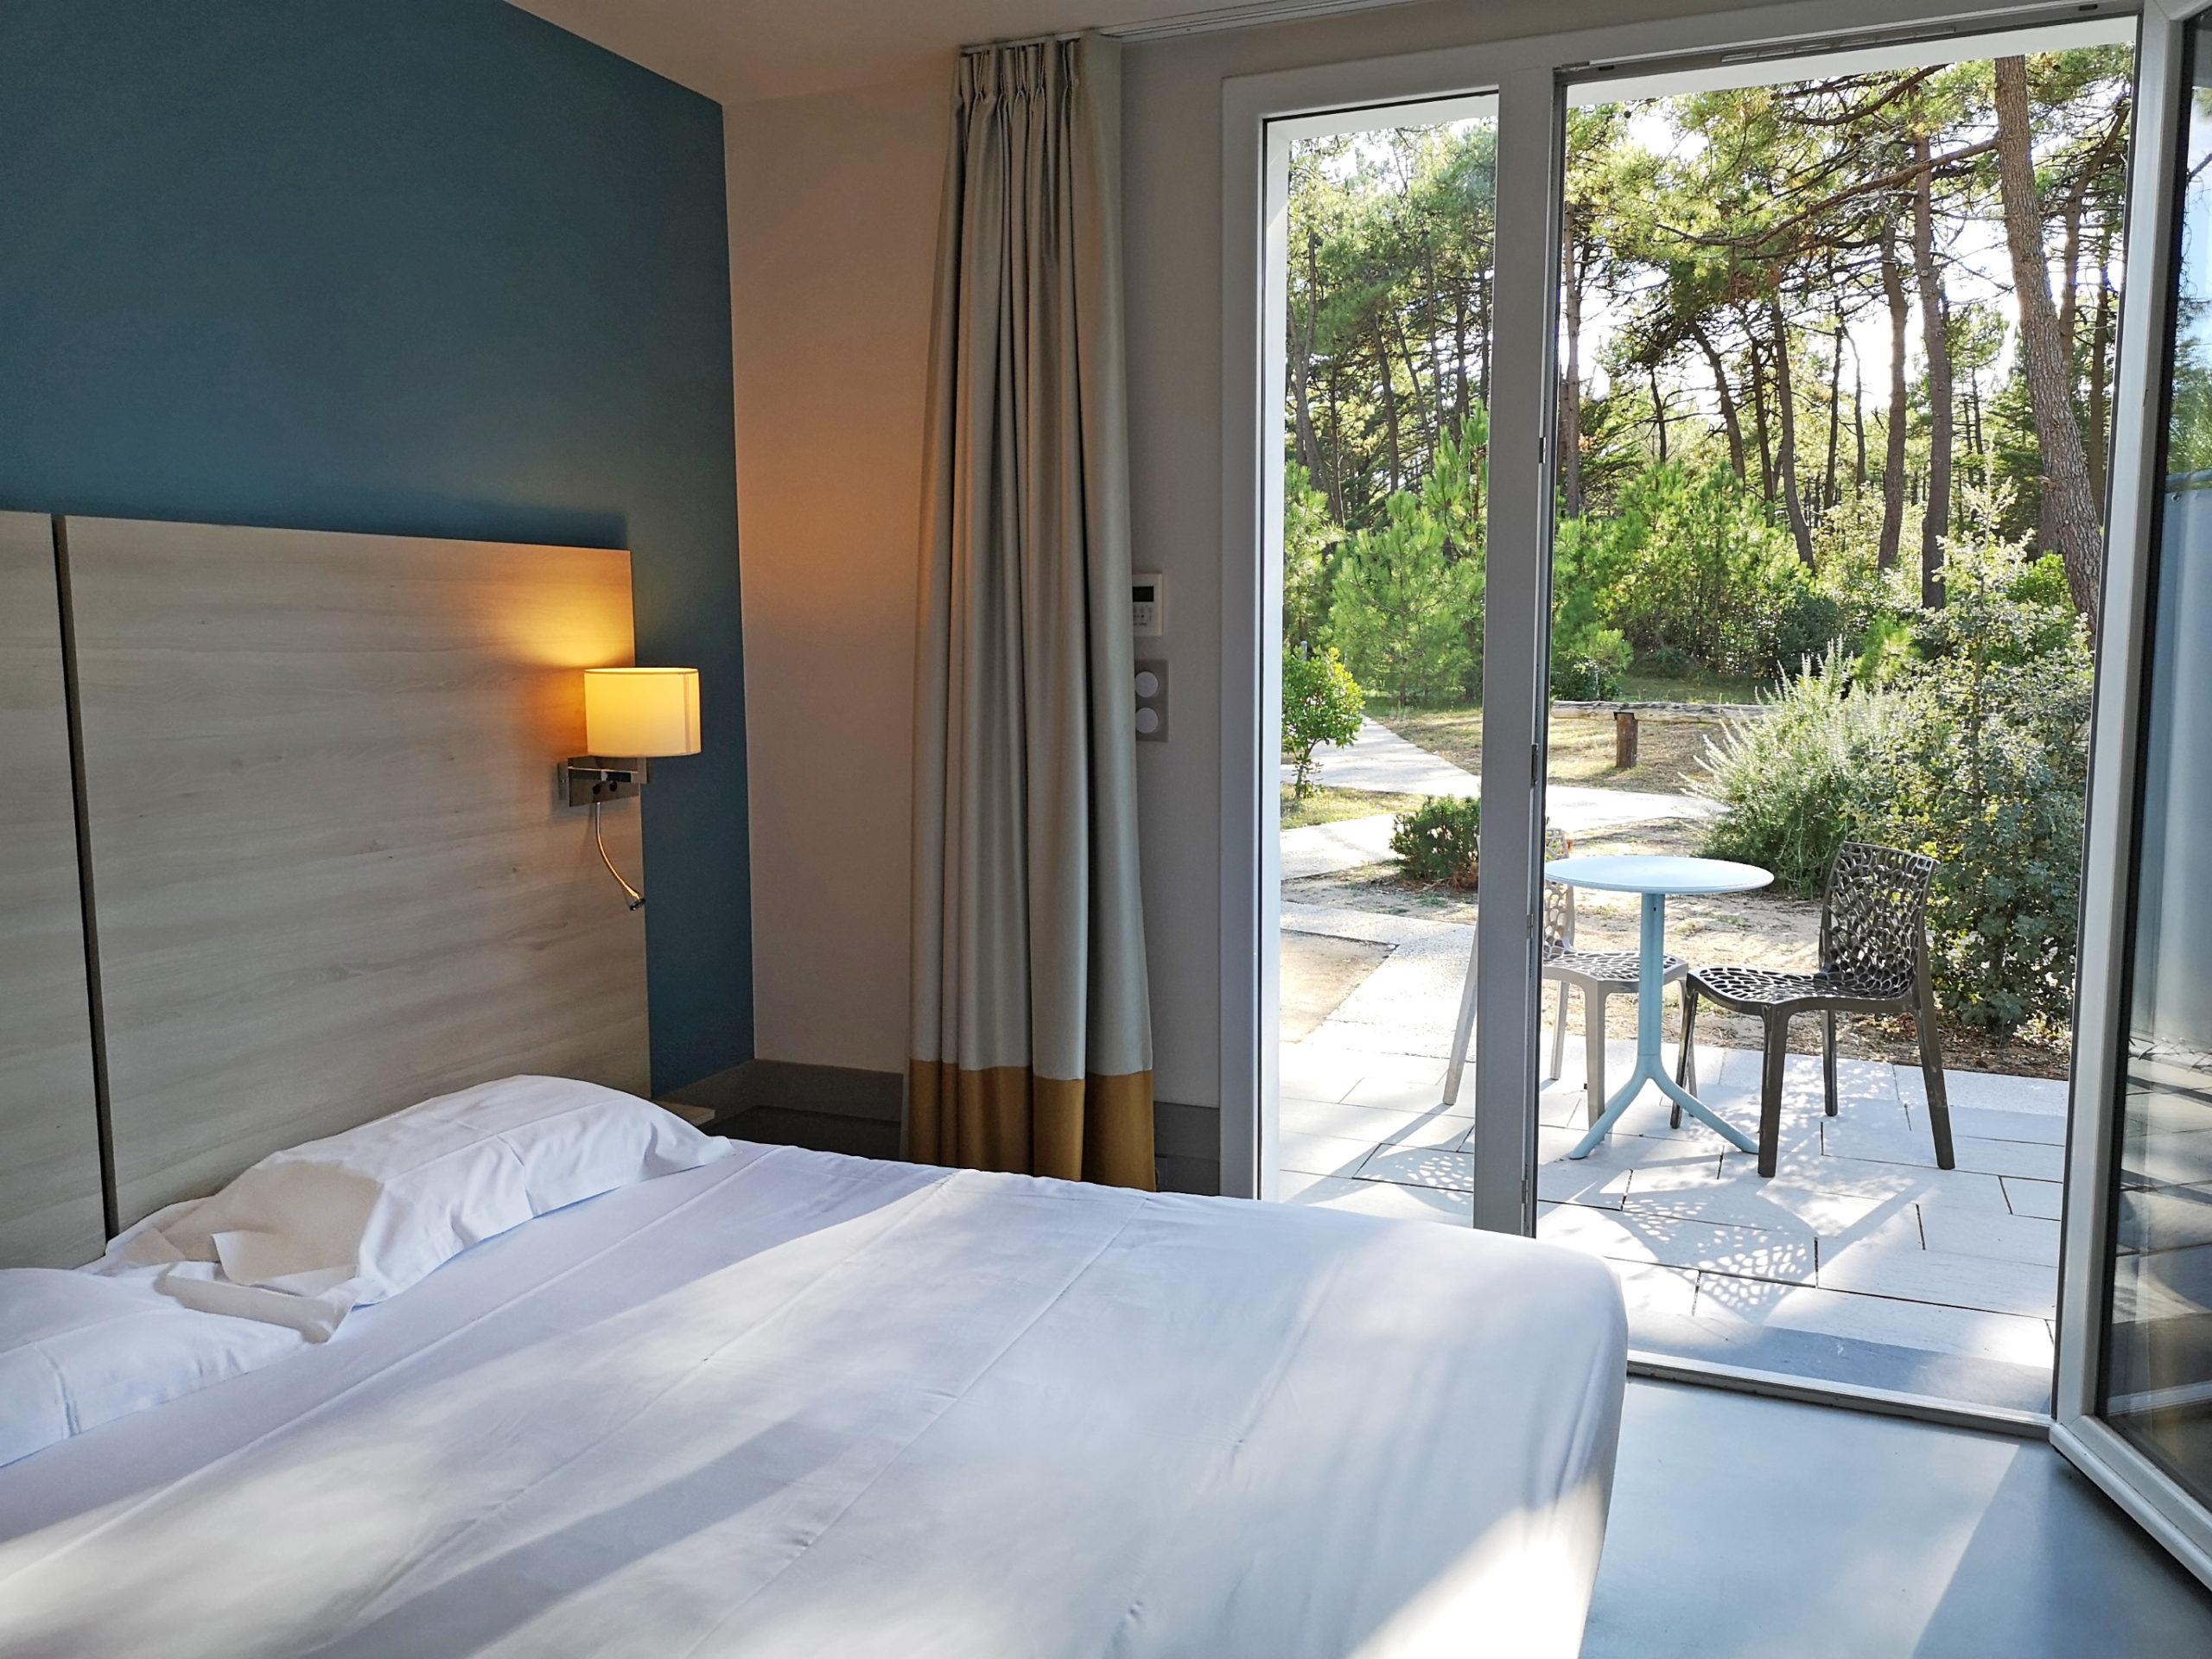 VE-chambre-double-terrasse-bleu2